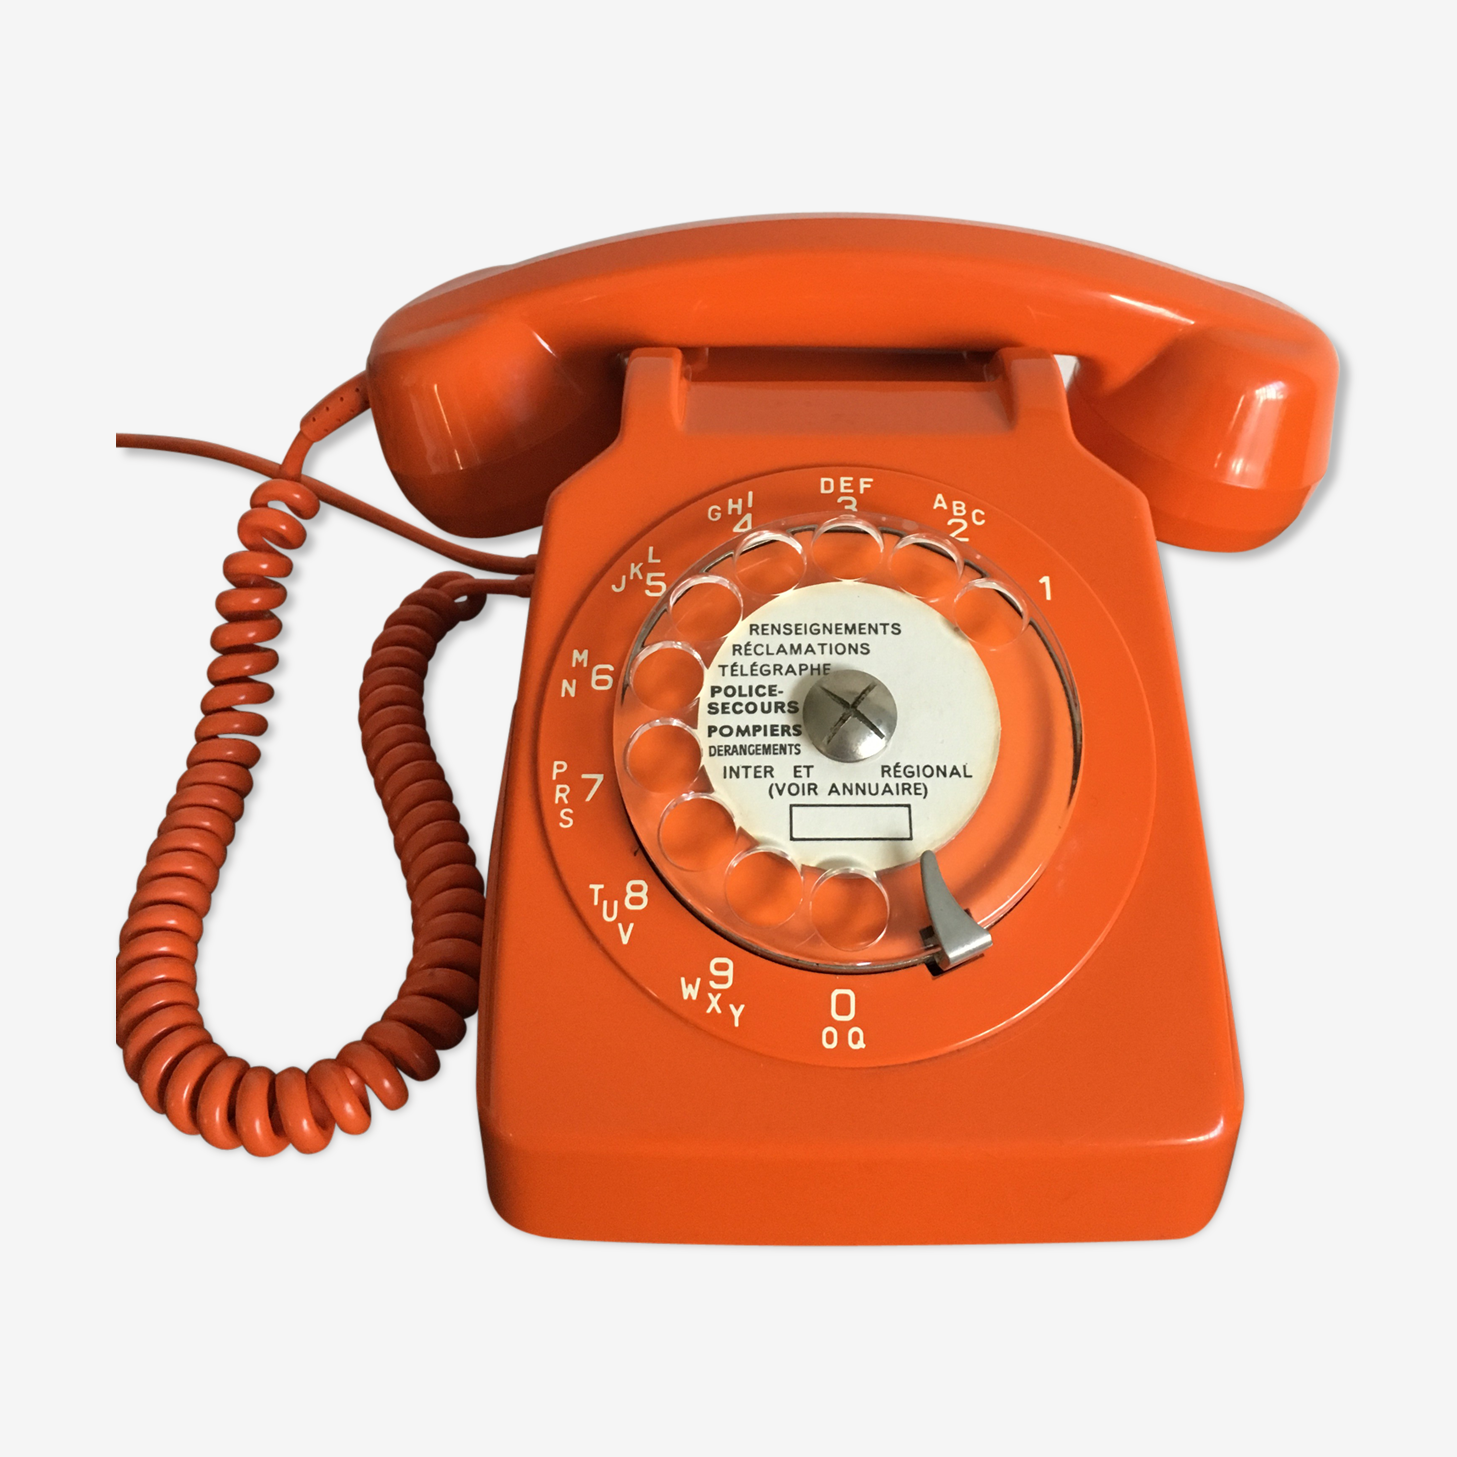 Vintage rotary S63 phone